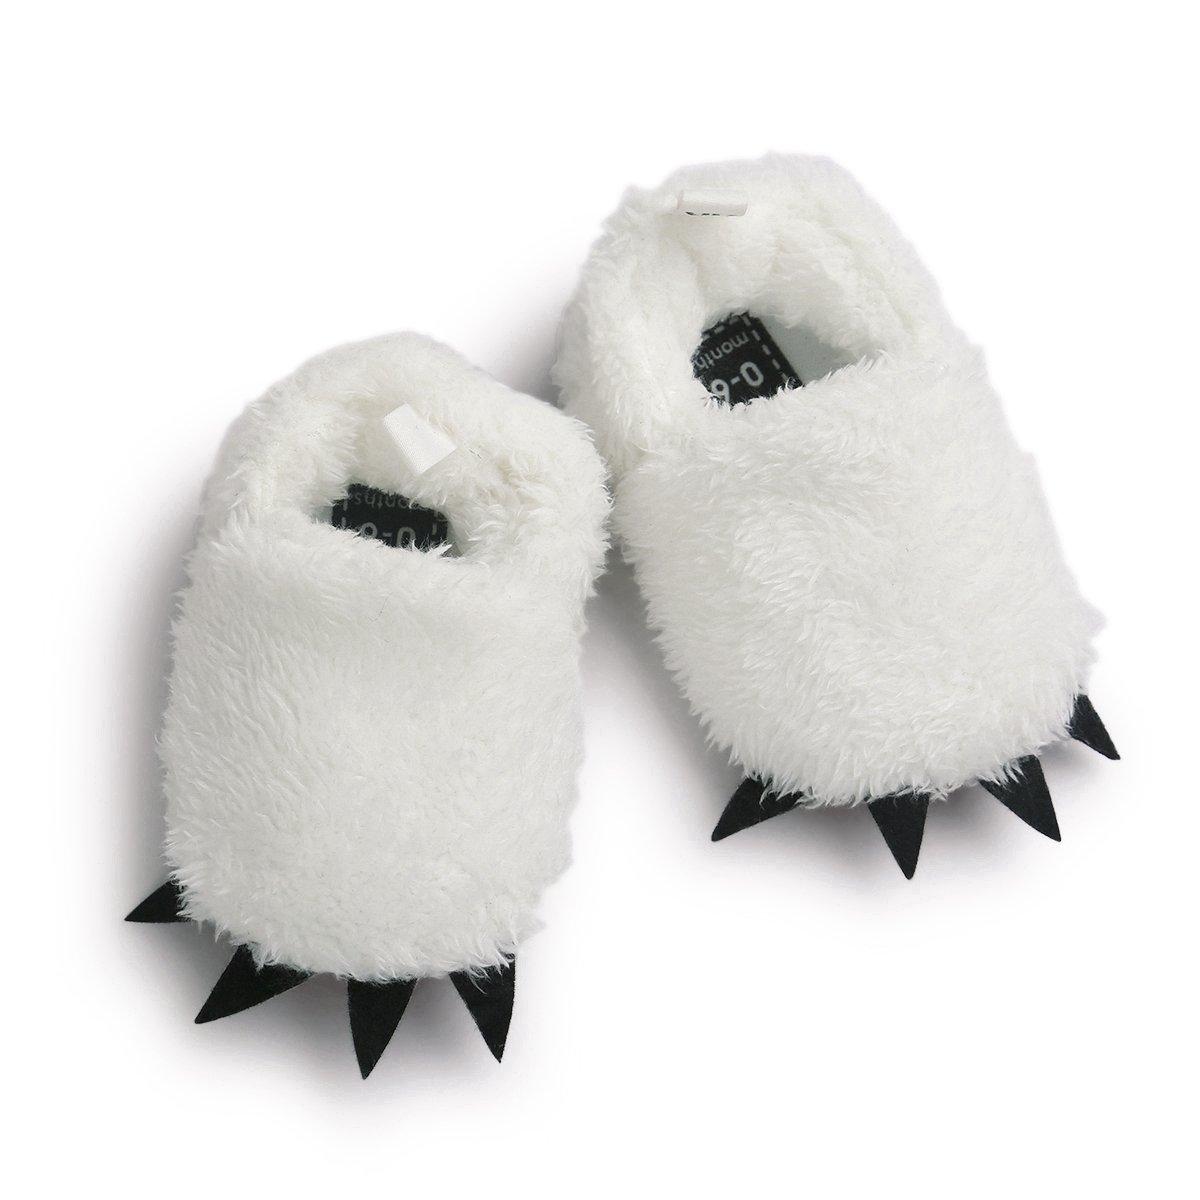 Vanbuy Baby Boys Girls Shoes Bear Paw Animal Slippers Boots Newborn Infant Crib Shoes WB28-White-L by Vanbuy (Image #2)